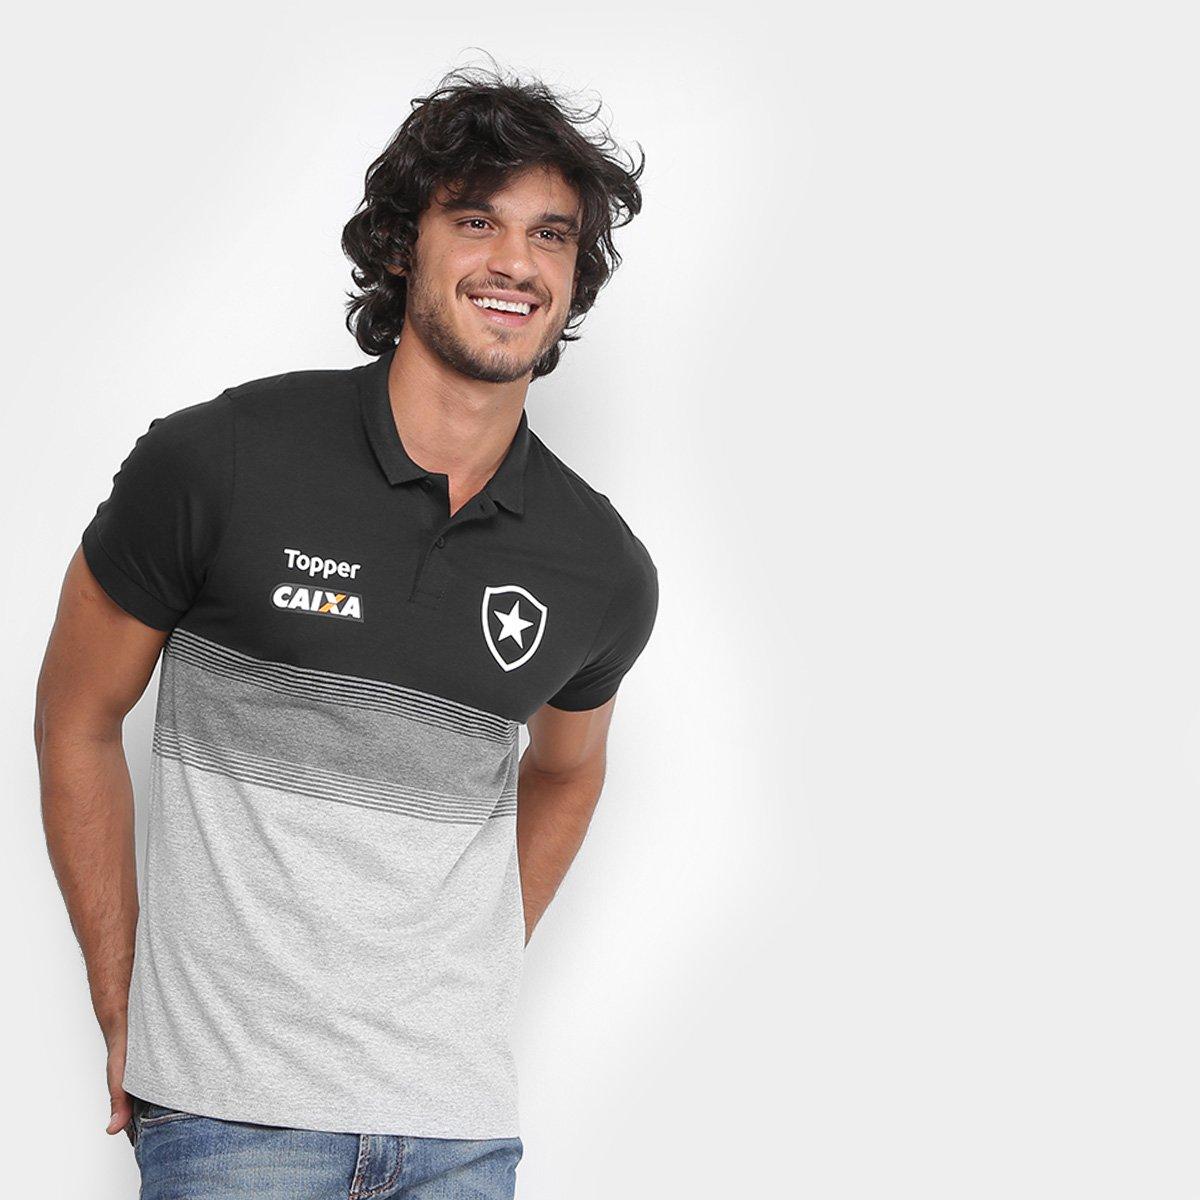 46874e47fdff5 Camisa Polo Botafogo Viagem Topper Masculina - Preto e Chumbo - Compre  Agora